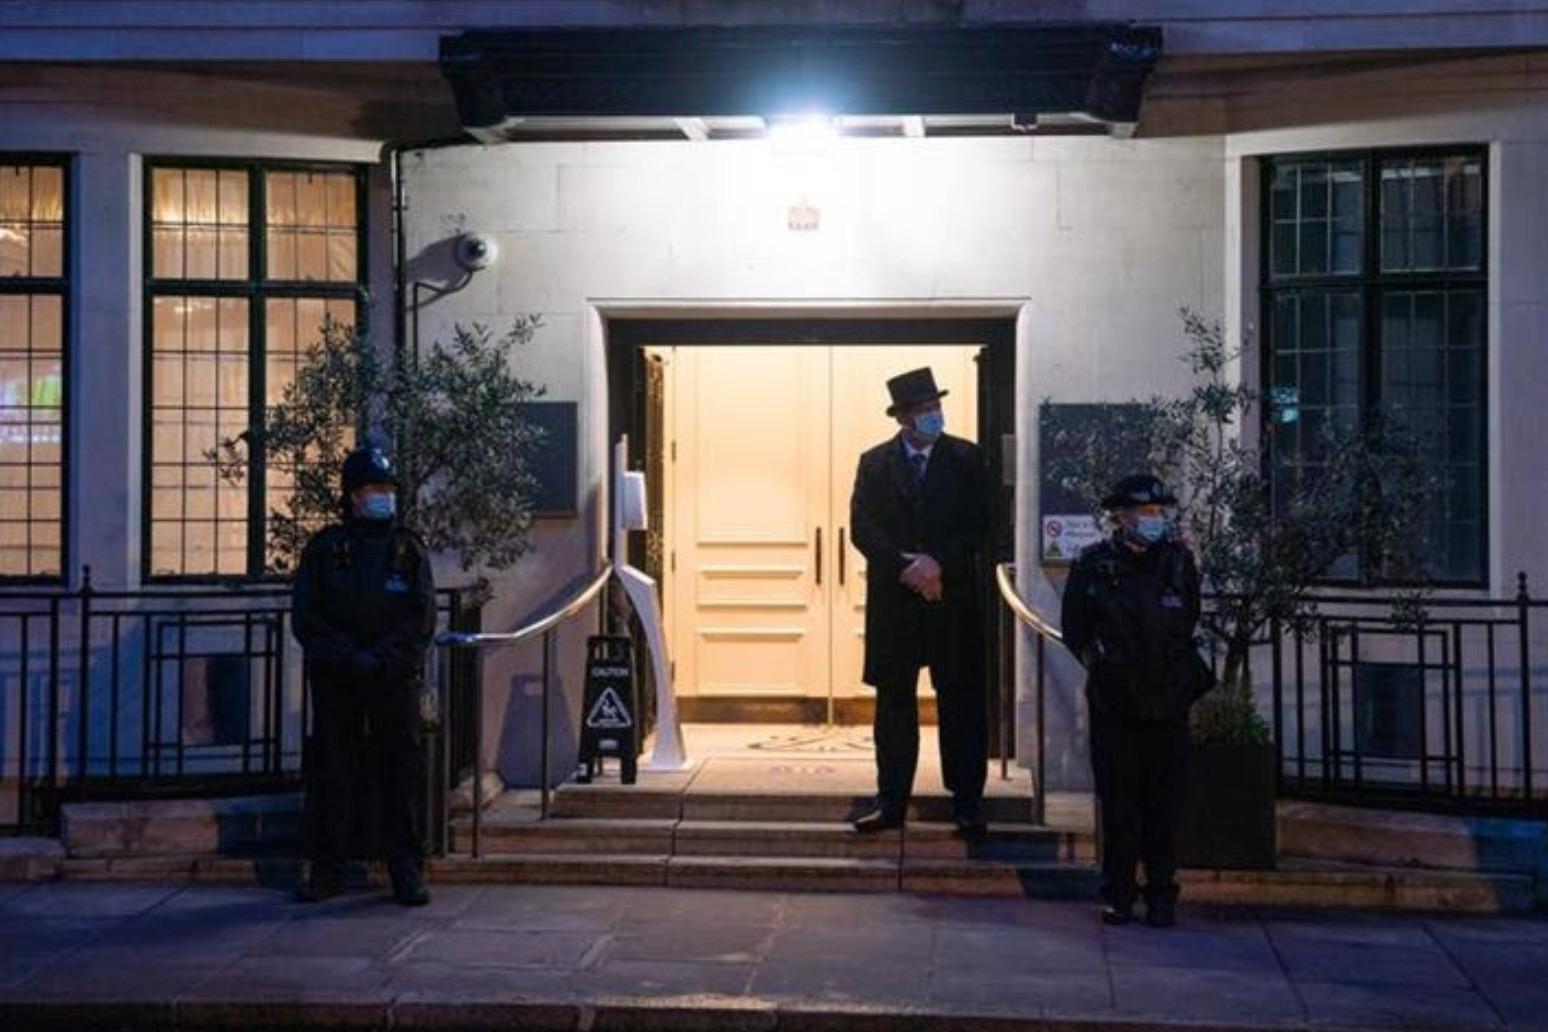 Duke of Edinburgh spends second night in hospital